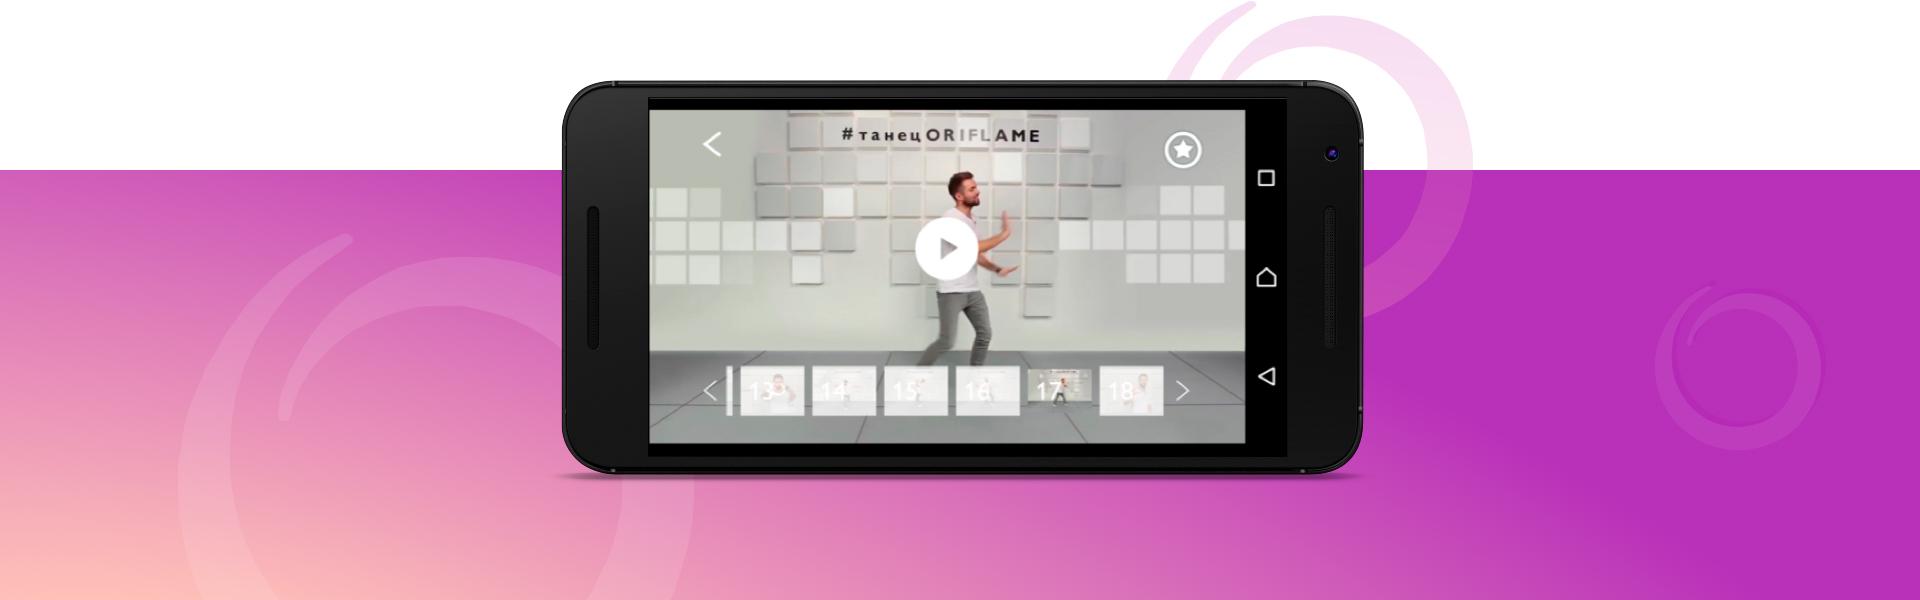 Oriflame app onboarding